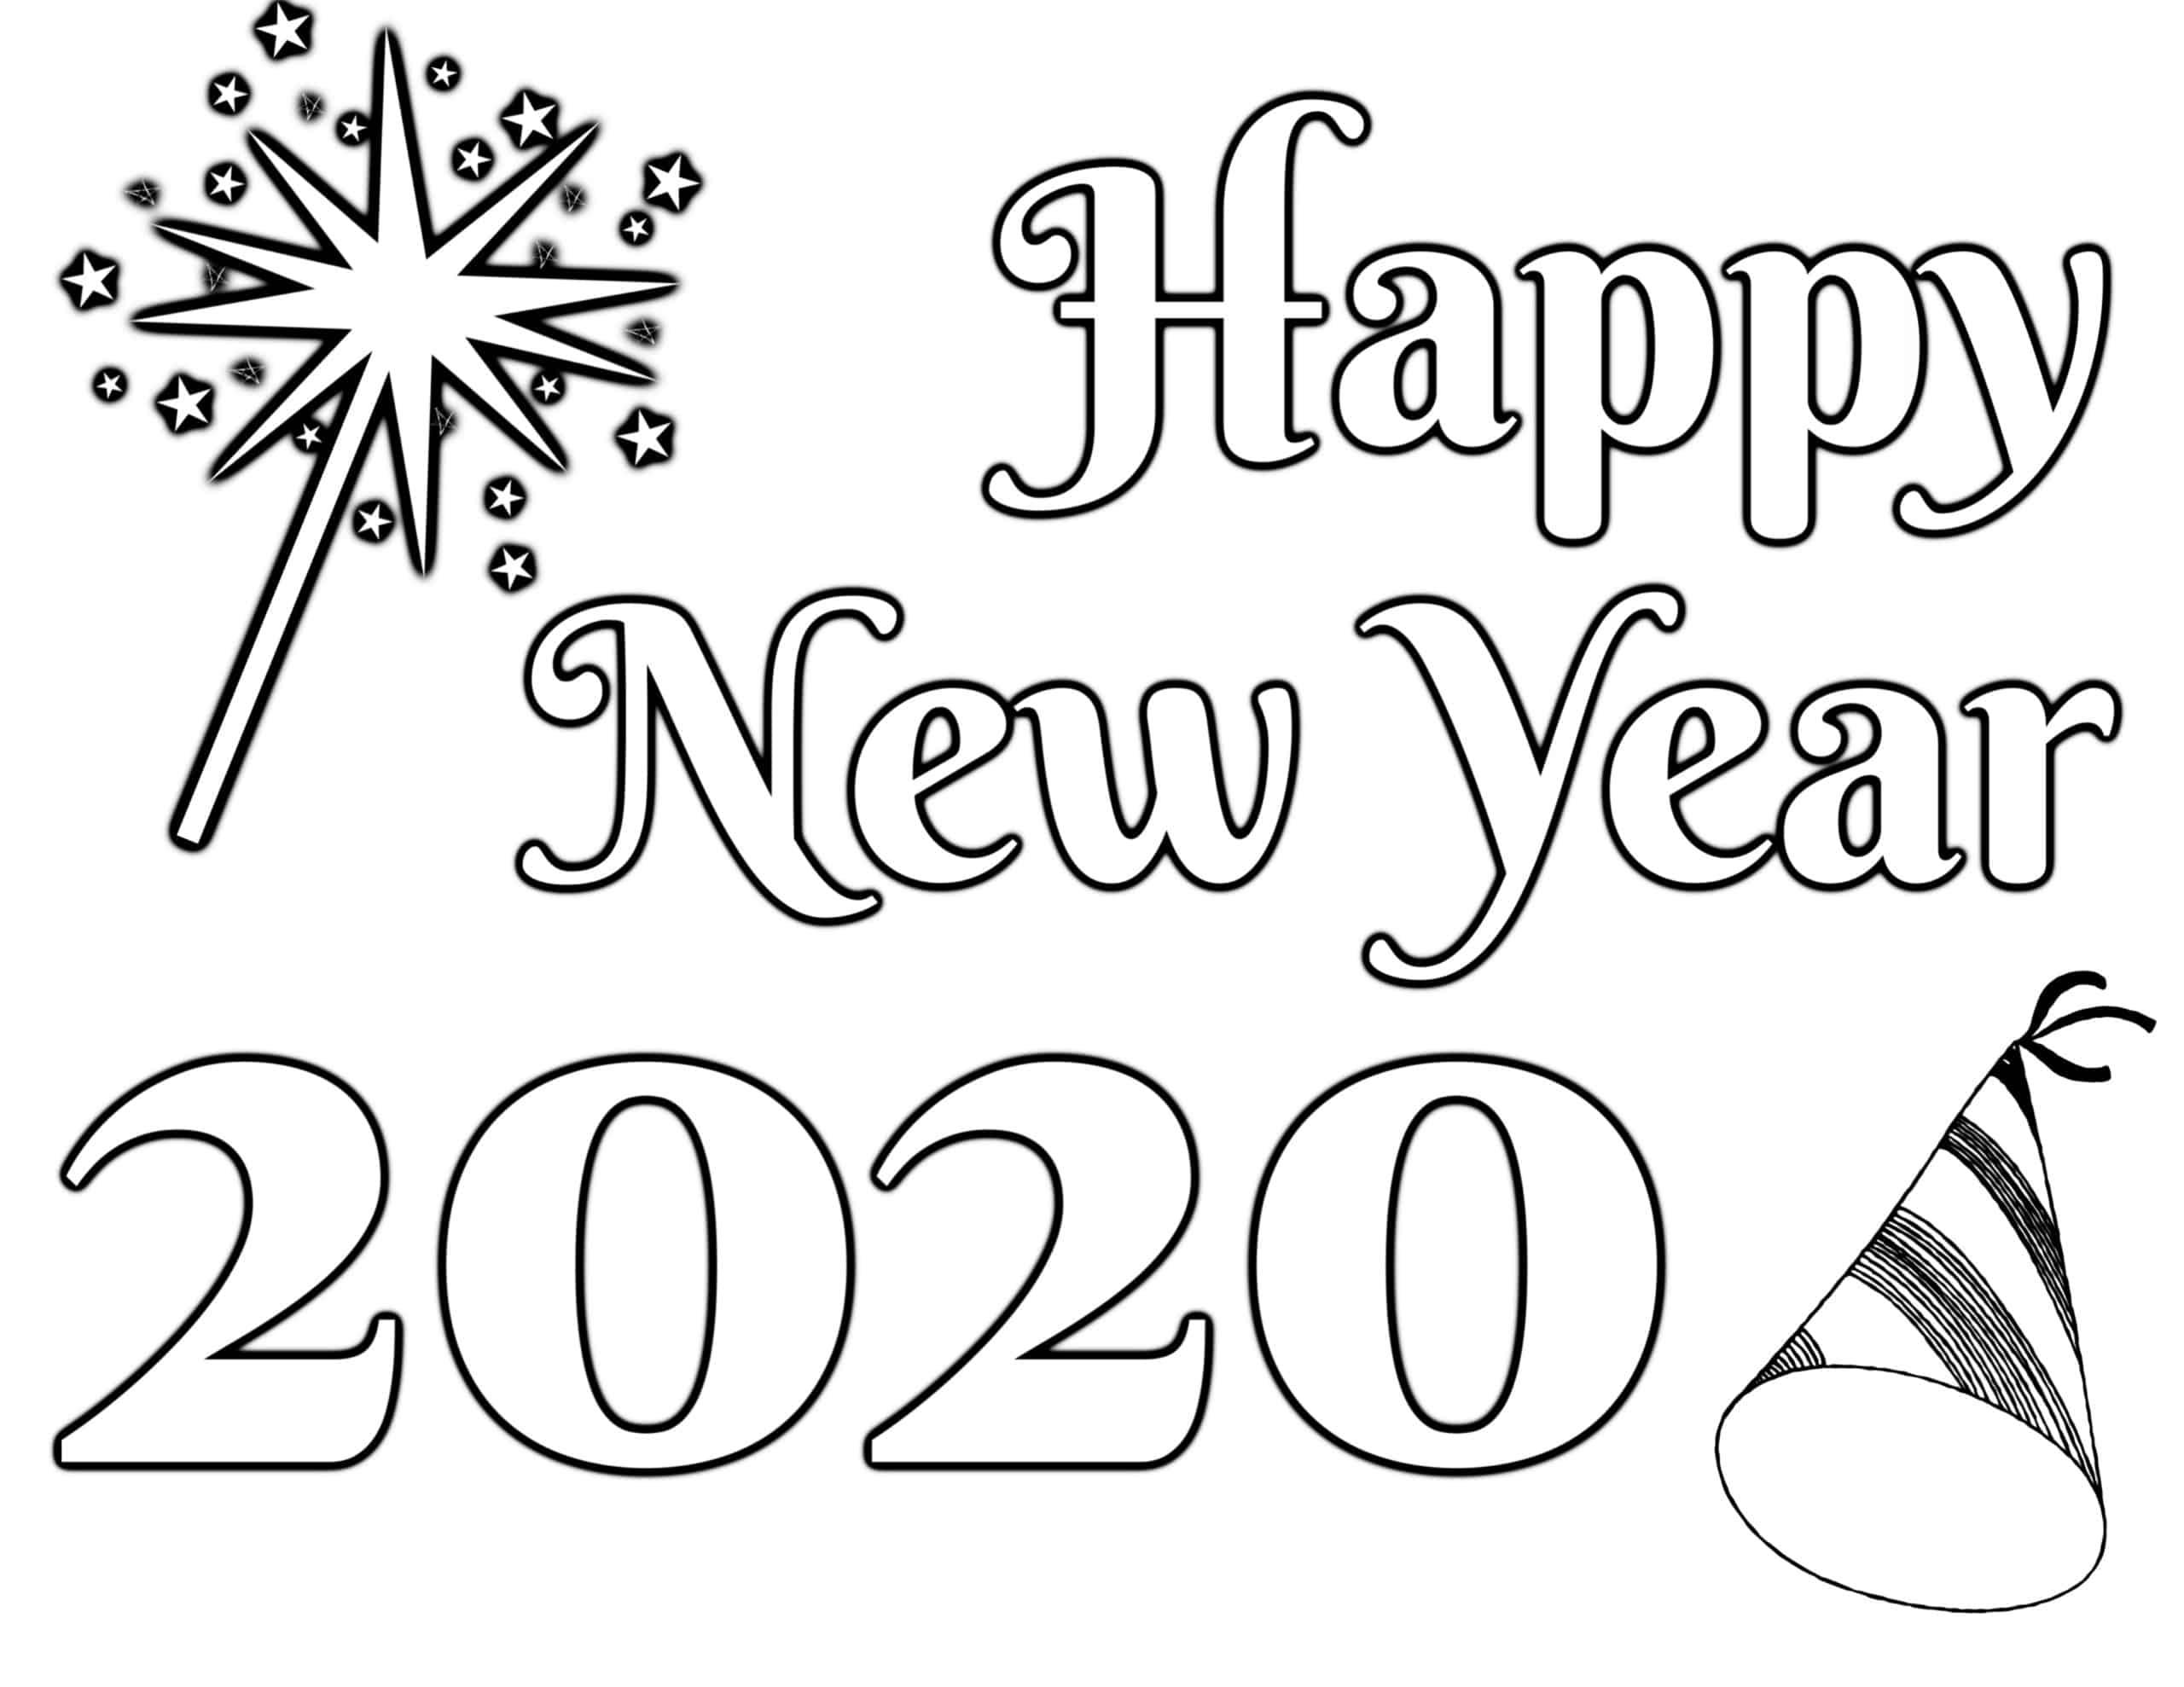 January Chinese New Year Worksheet For Kindergarten